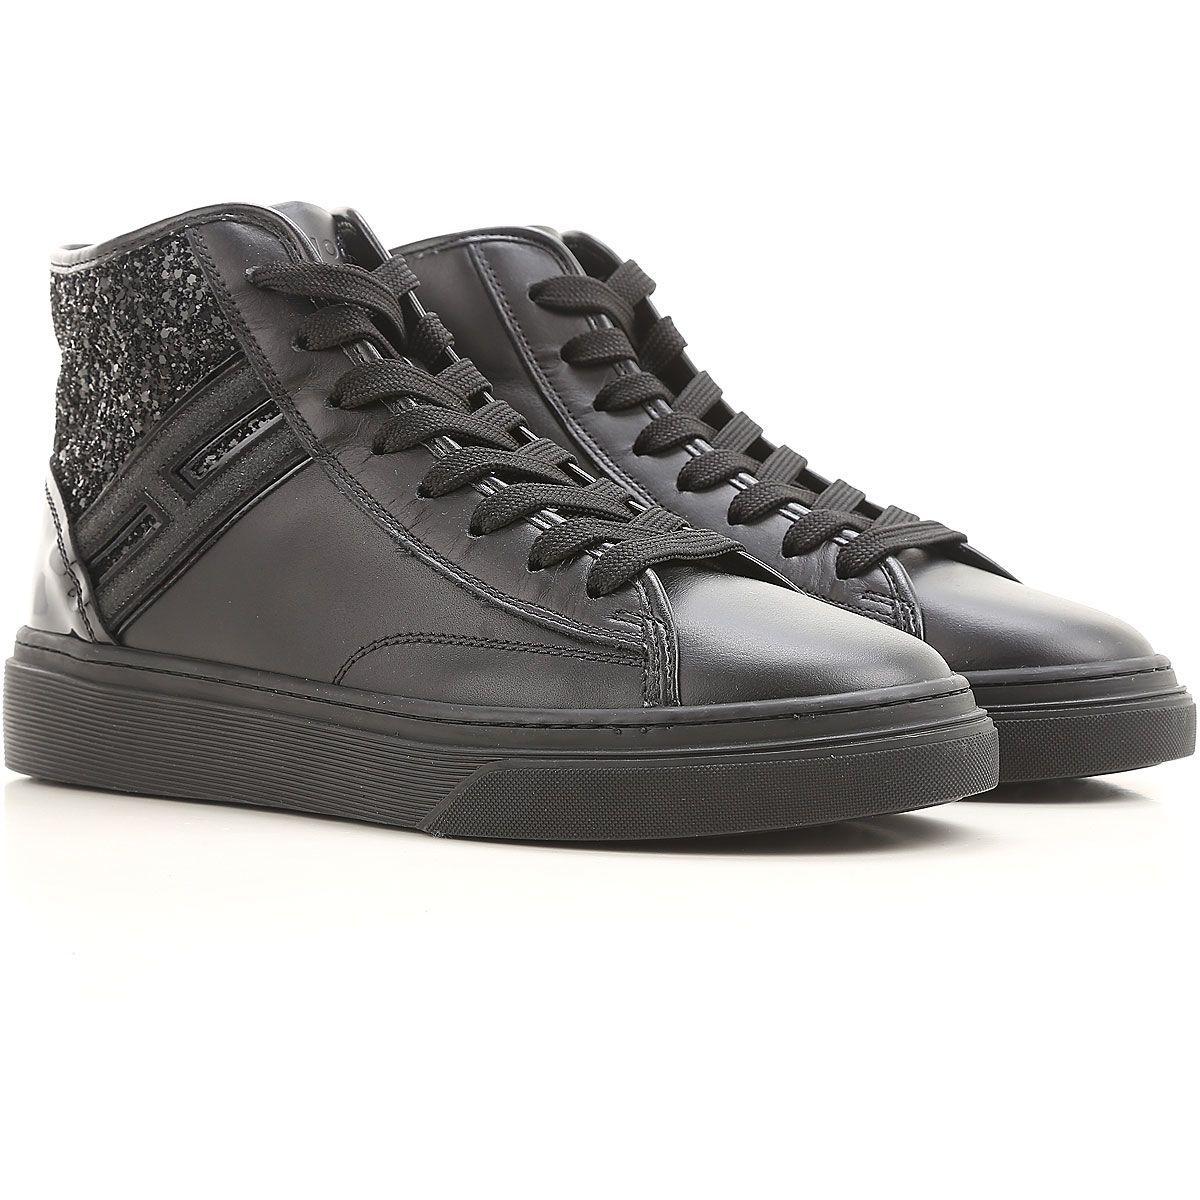 HOGAN | Hogan High-top Sneakers H342 #Shoes #Sneakers #HOGAN ...